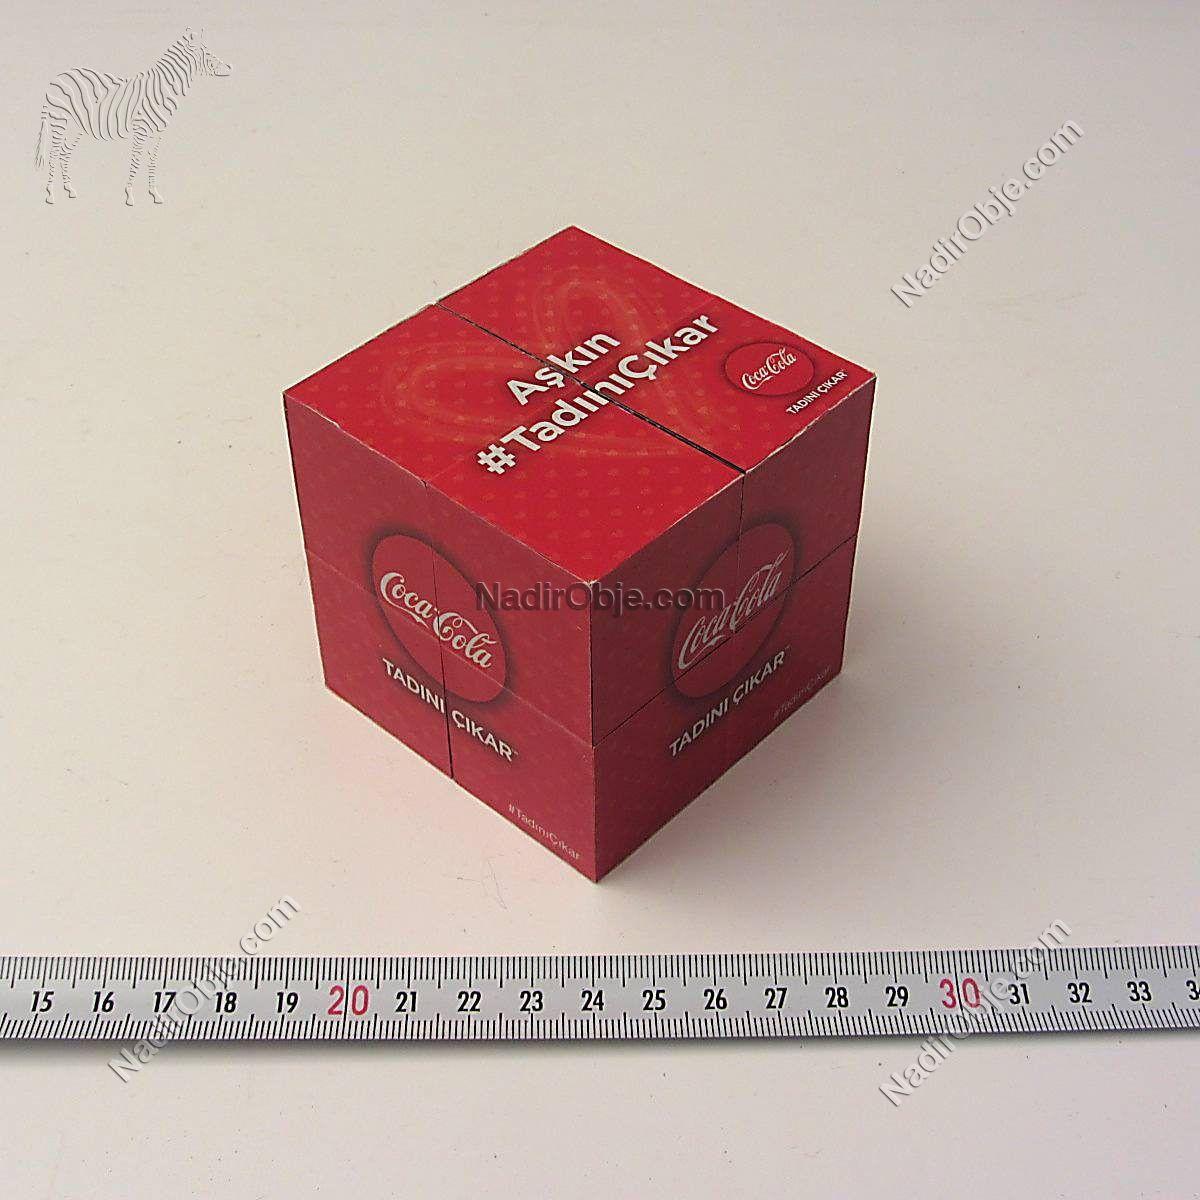 Coca Cola Sihirli Küp Diğer Objeler Coca Cola